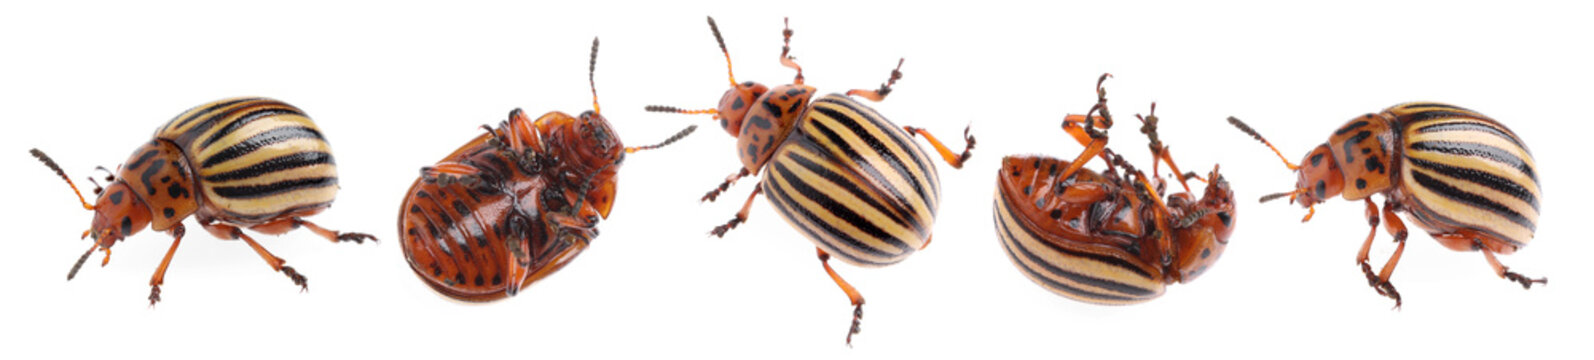 Colorado potato beetles on white background, collage. Banner design